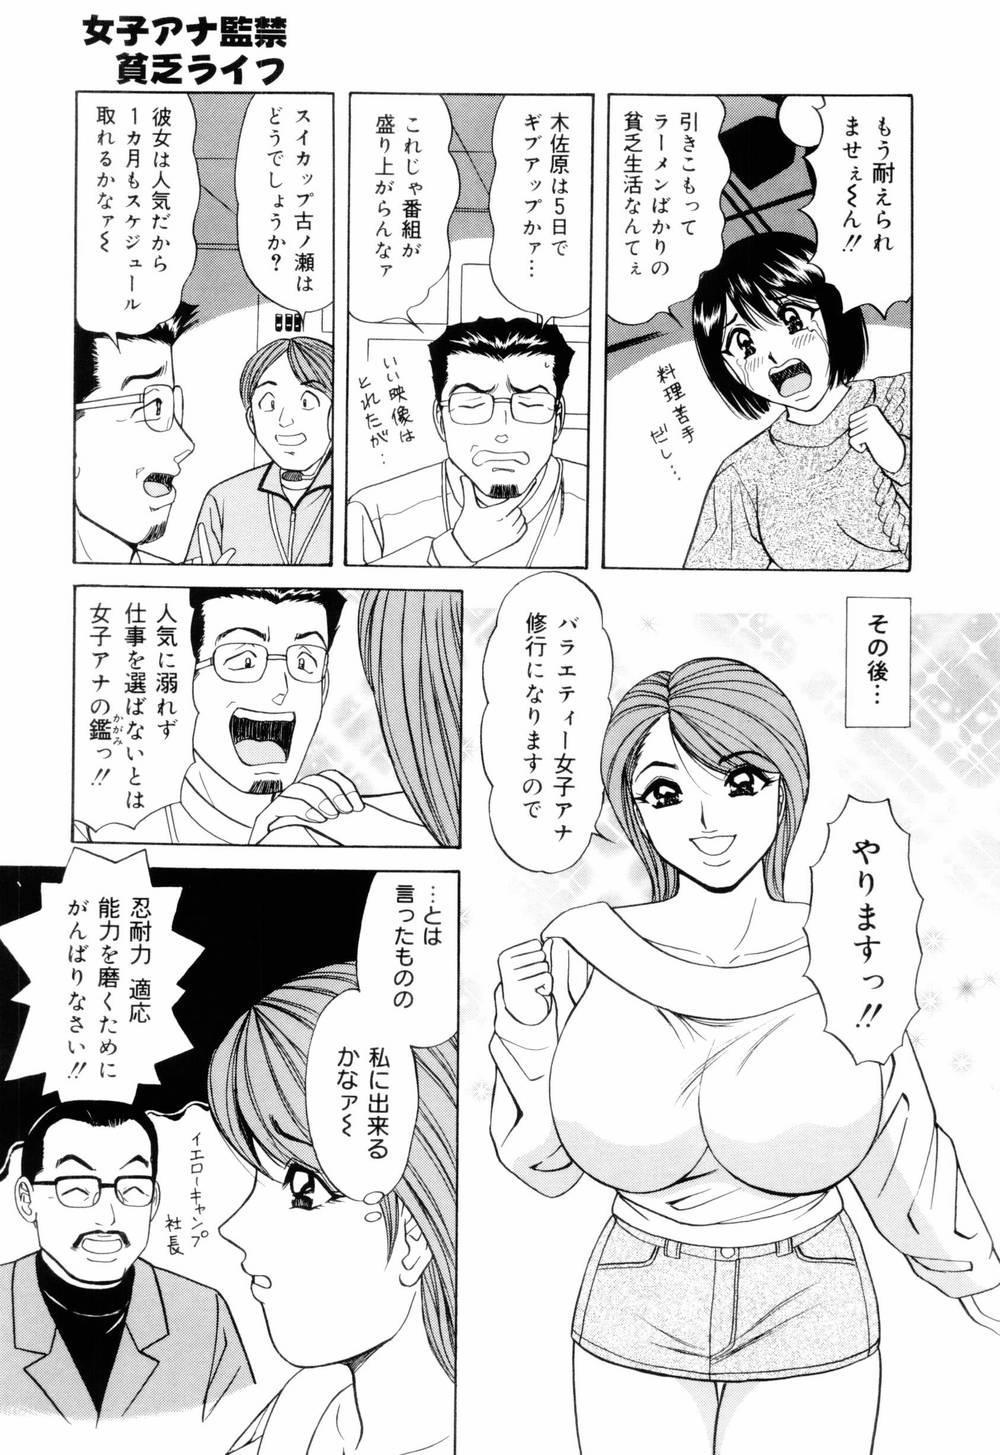 SuiCup Joshi Announcer Jikkyo Chukei Rape 12